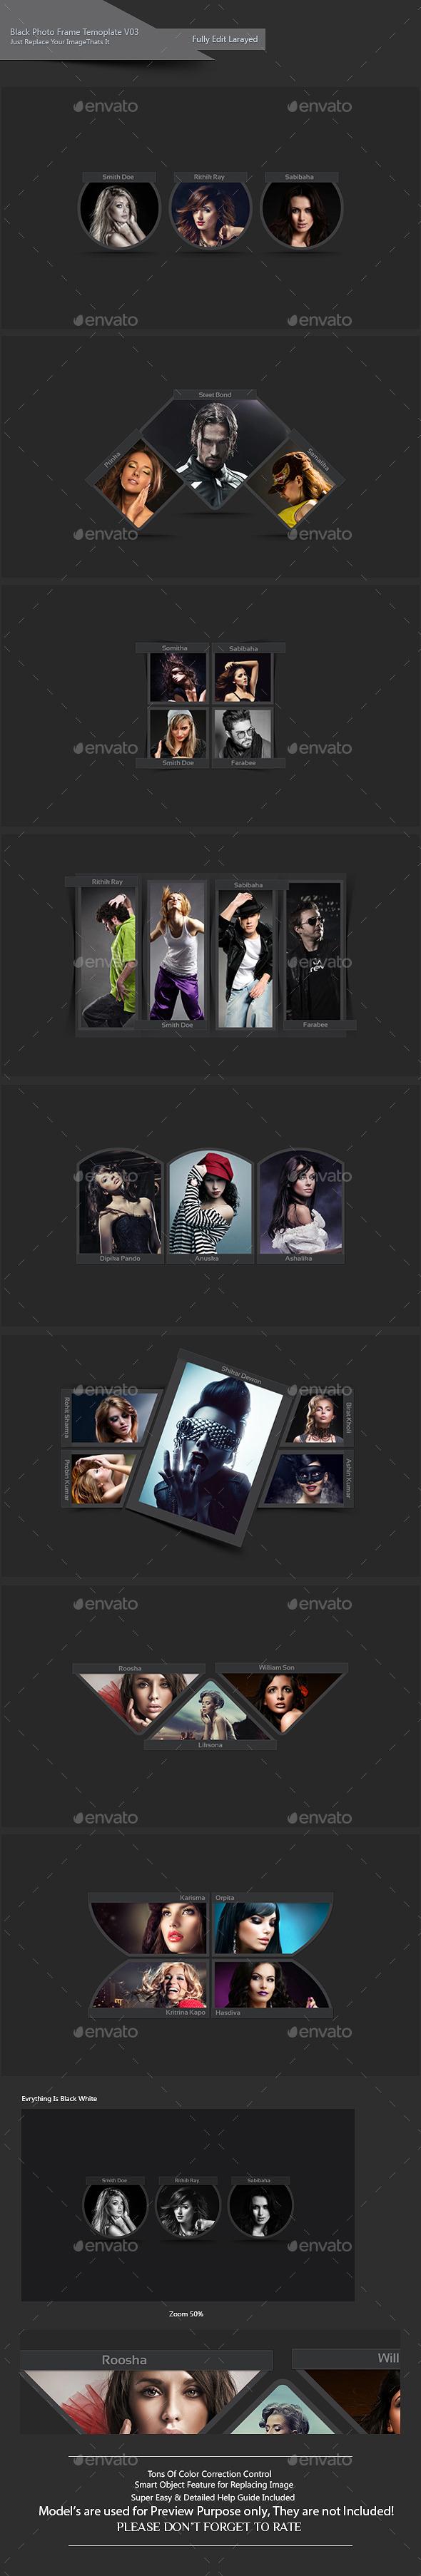 GraphicRiver Black Photo Frame Template V03 11828057